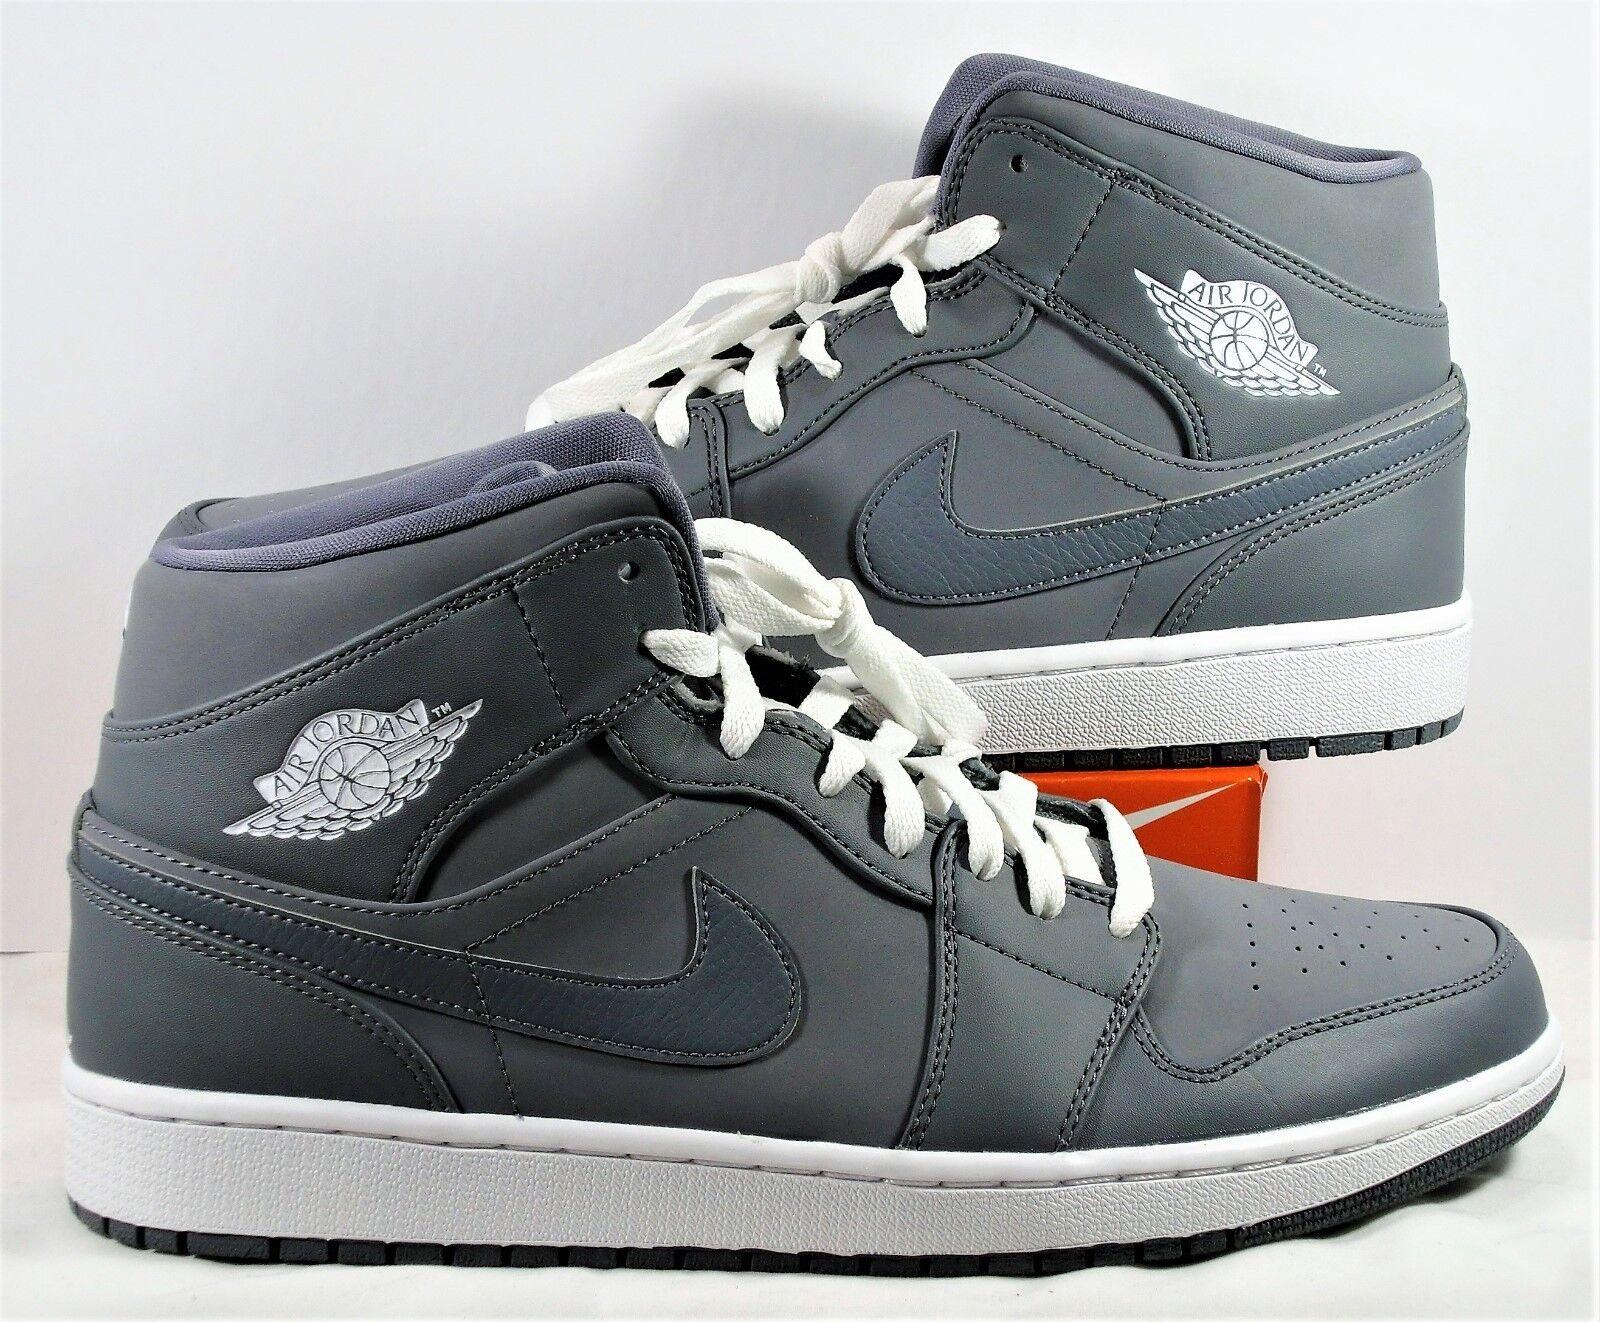 Air Jordan 1 Retro Mid Basketball Shoes Cool Grey & 13 White Sz 13 & NEW 554724 033 2bb7b9